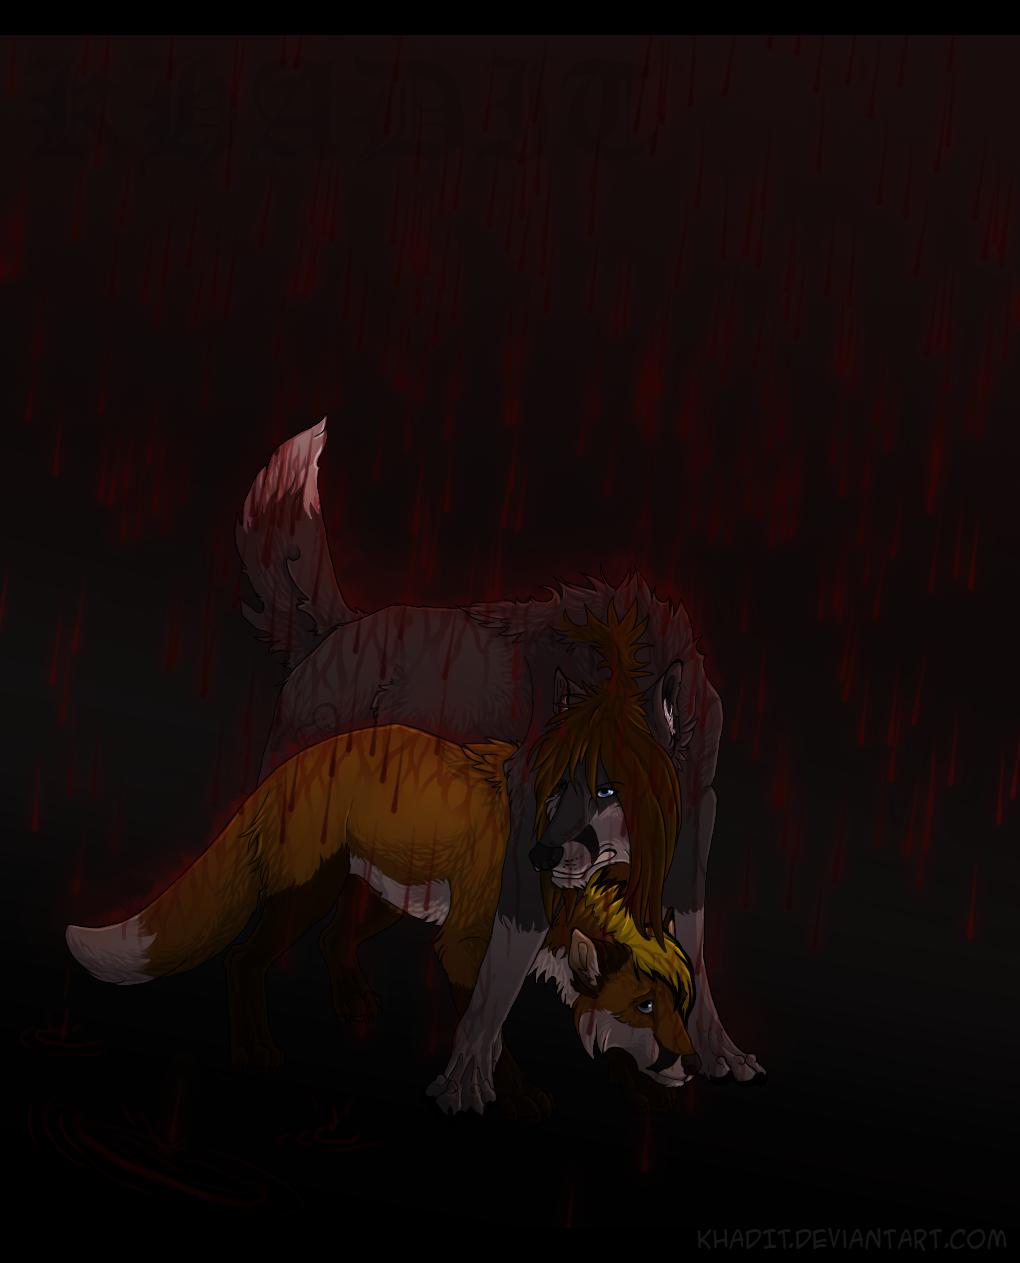 Crimson raindrop by Azenmaru